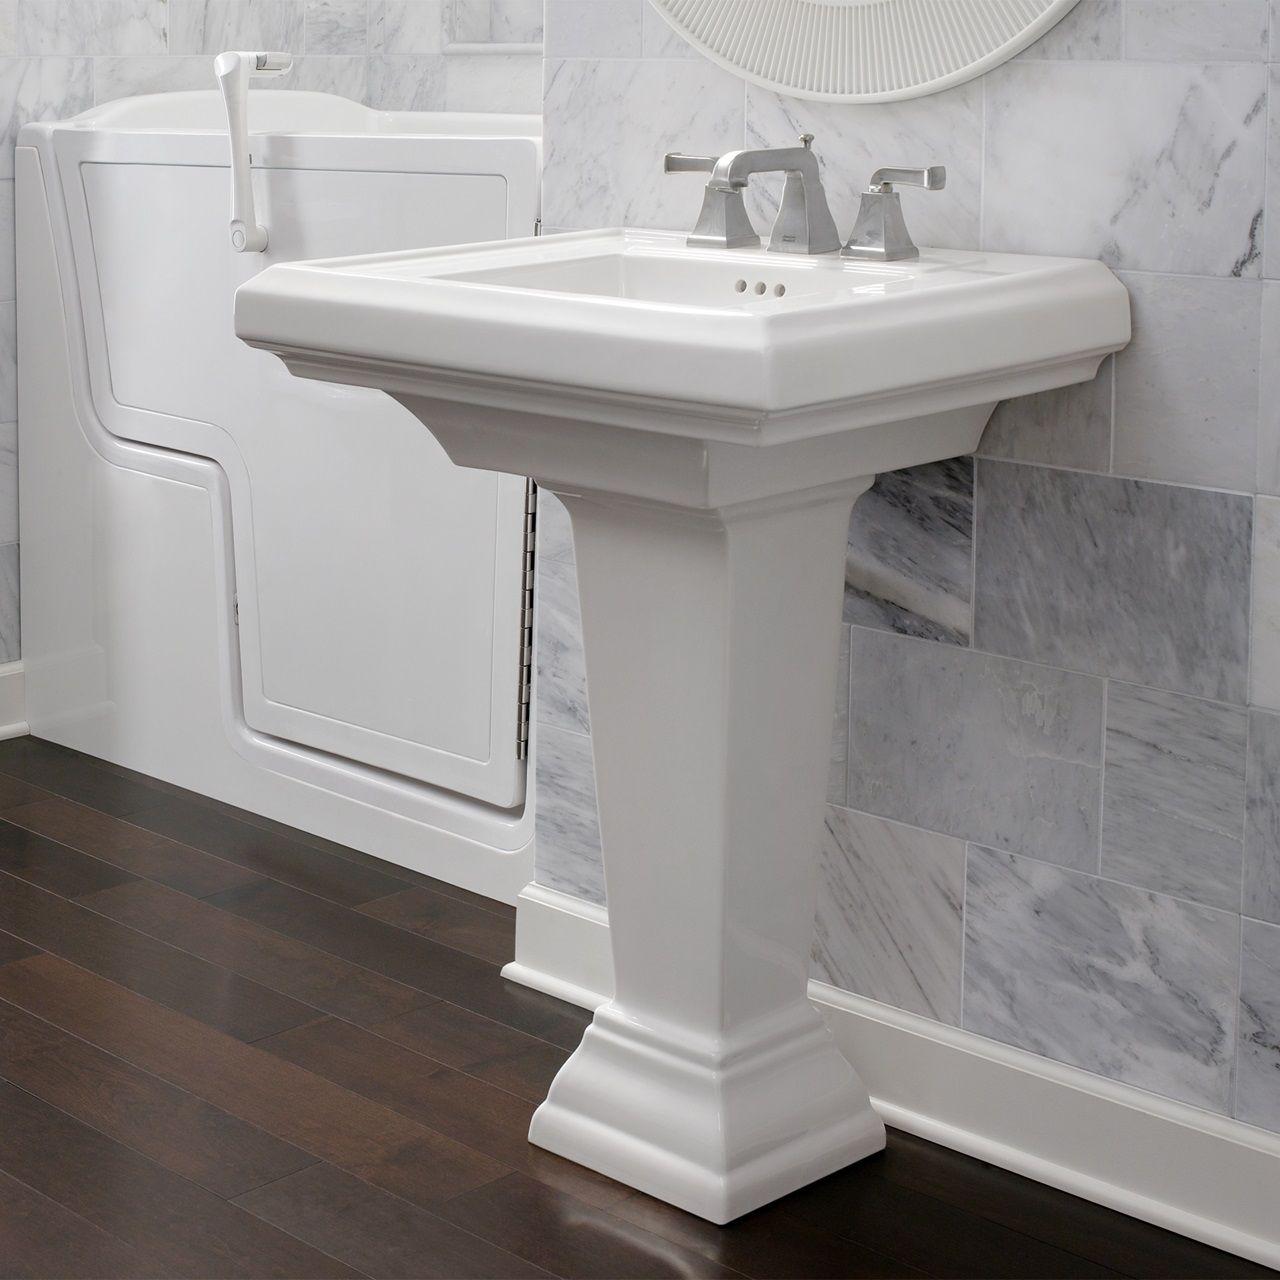 Bathroom Sinks Town Square 27 Inch Pedestal Sink White Sink